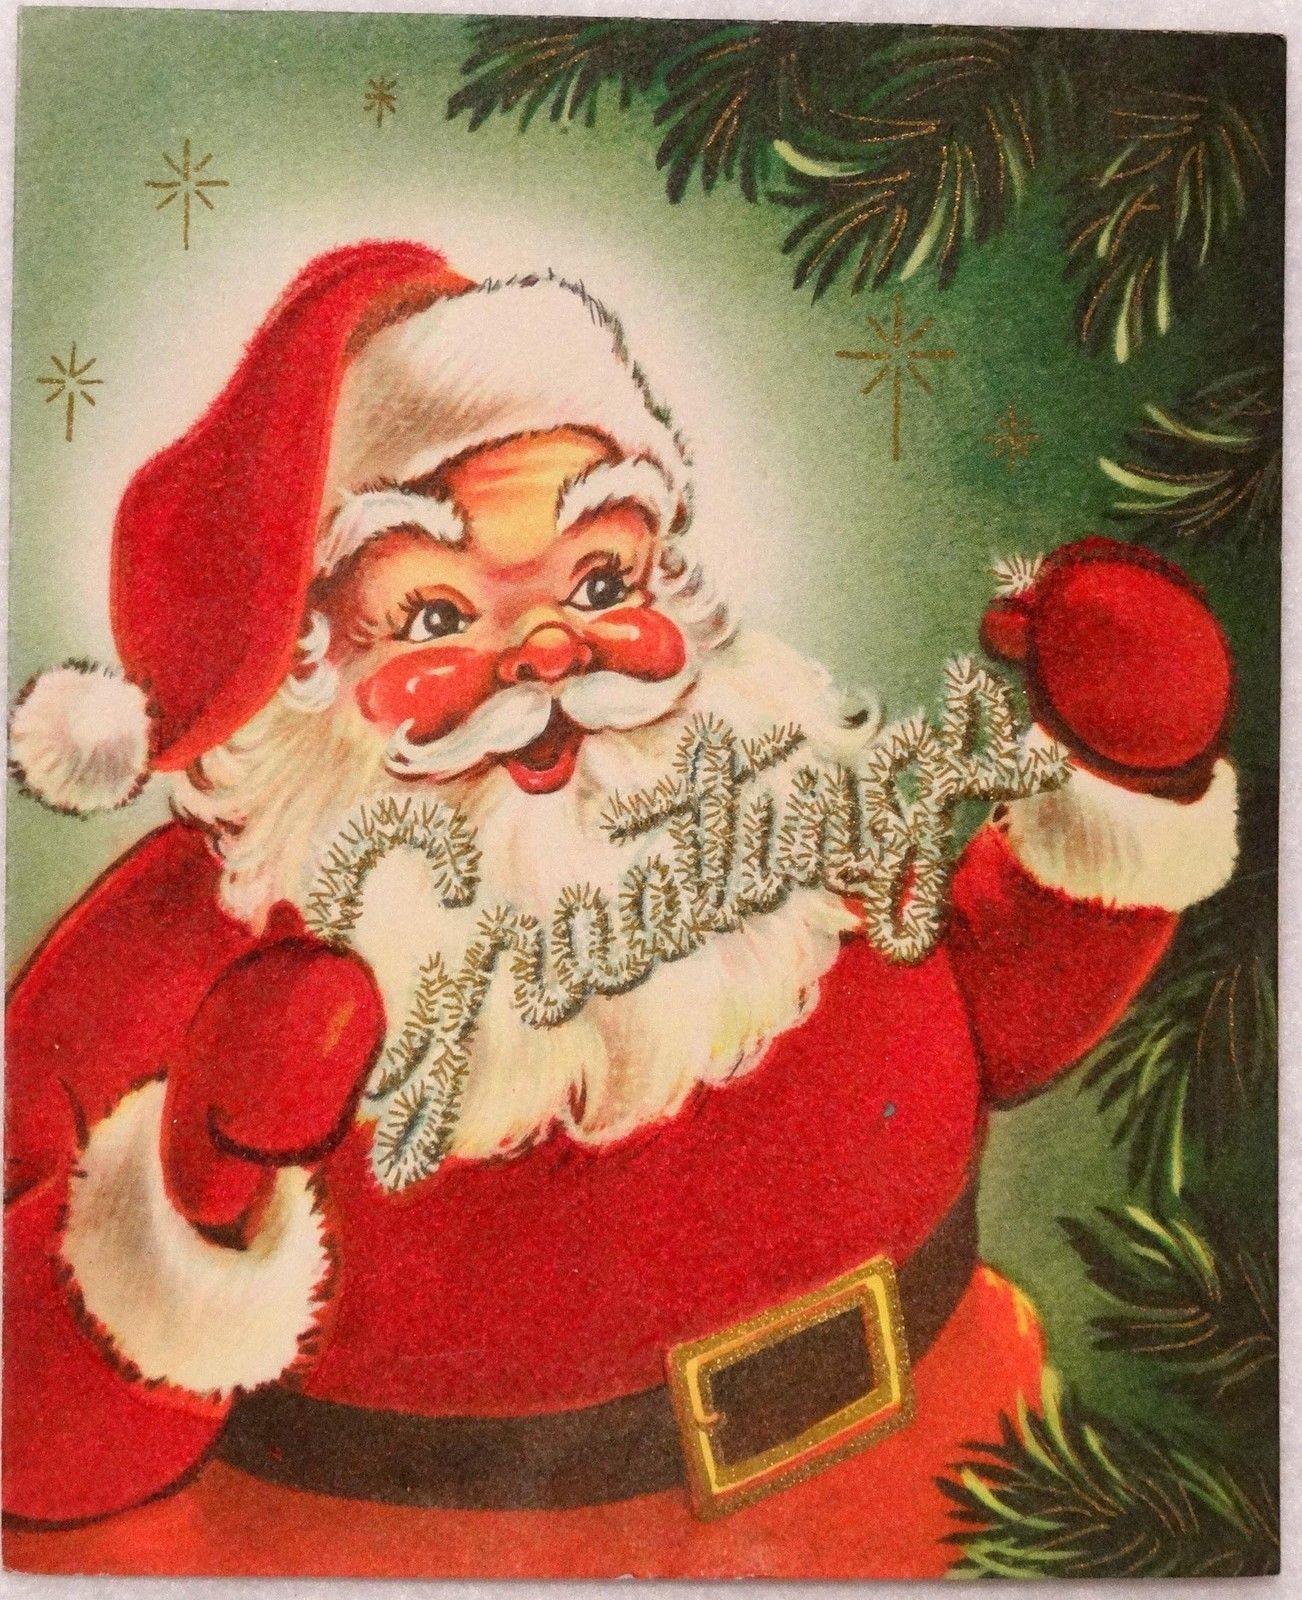 1180 50s Velvet Santa Claus Vintage Christmas Greeting